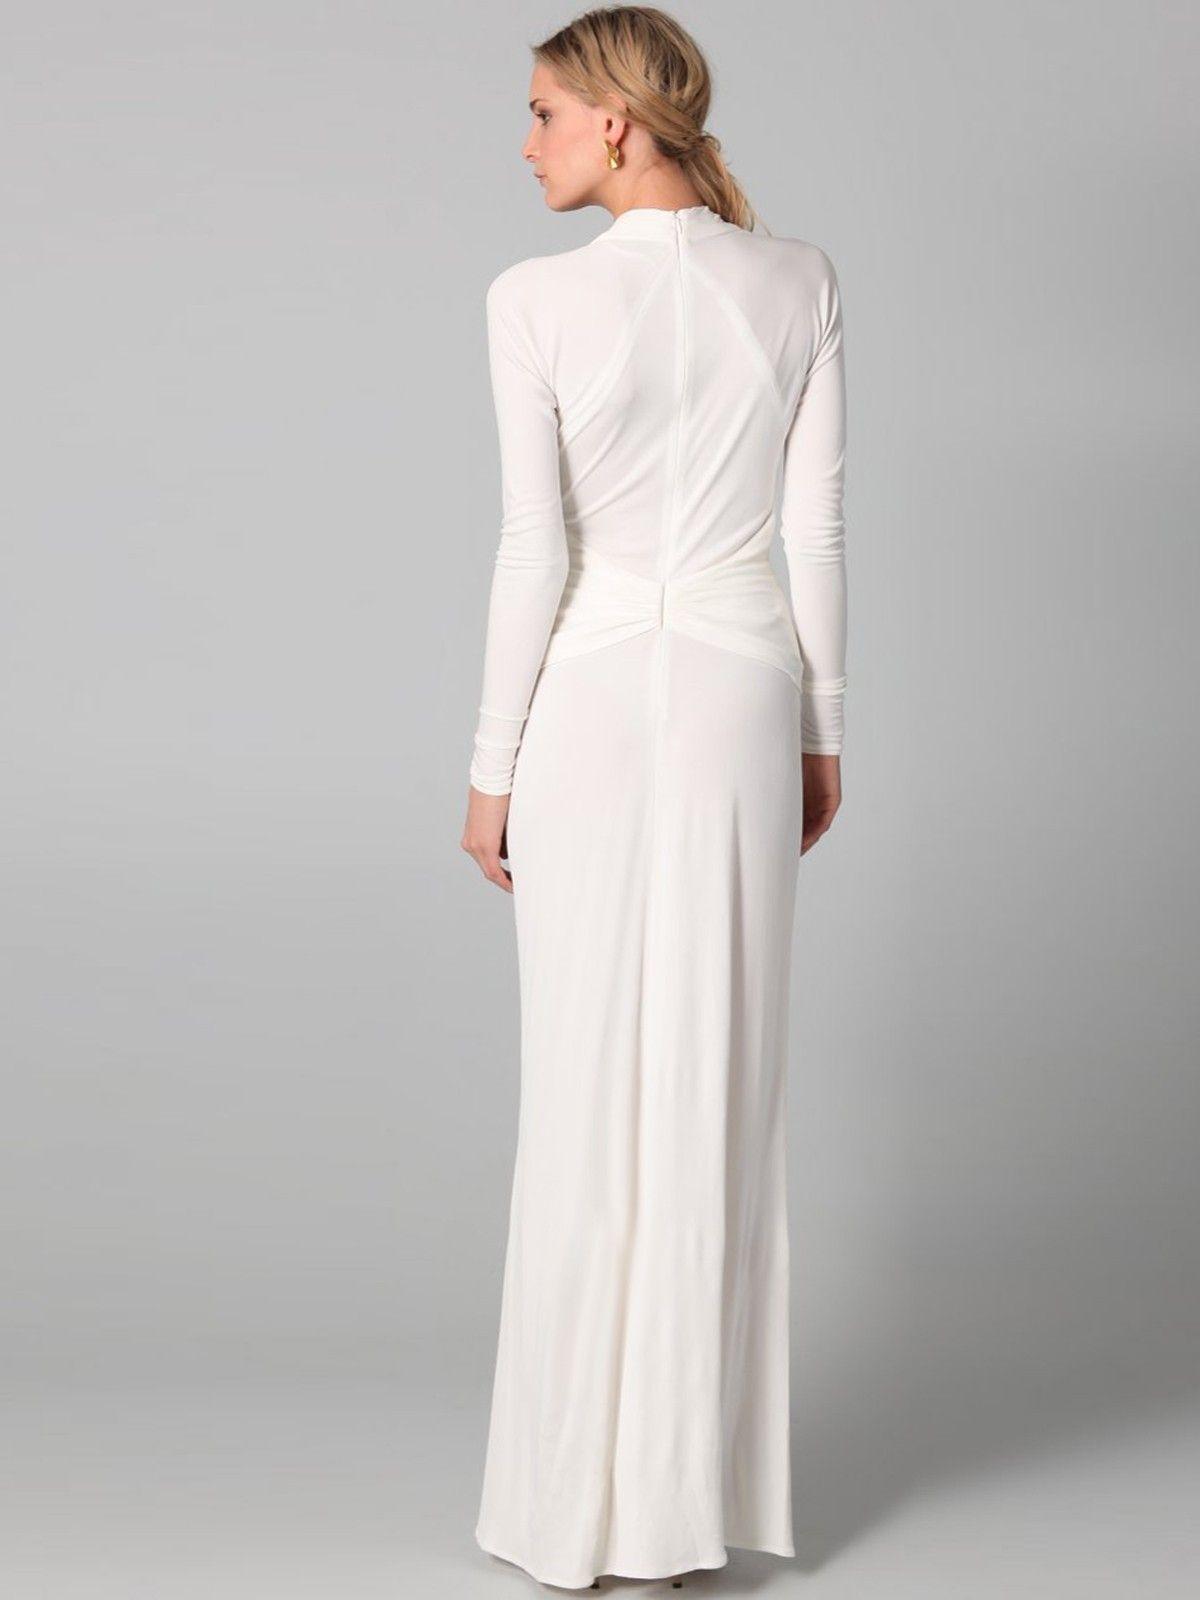 Long Sleeve Sheath Wedding Dress - Yahoo Image Search Results | My ...